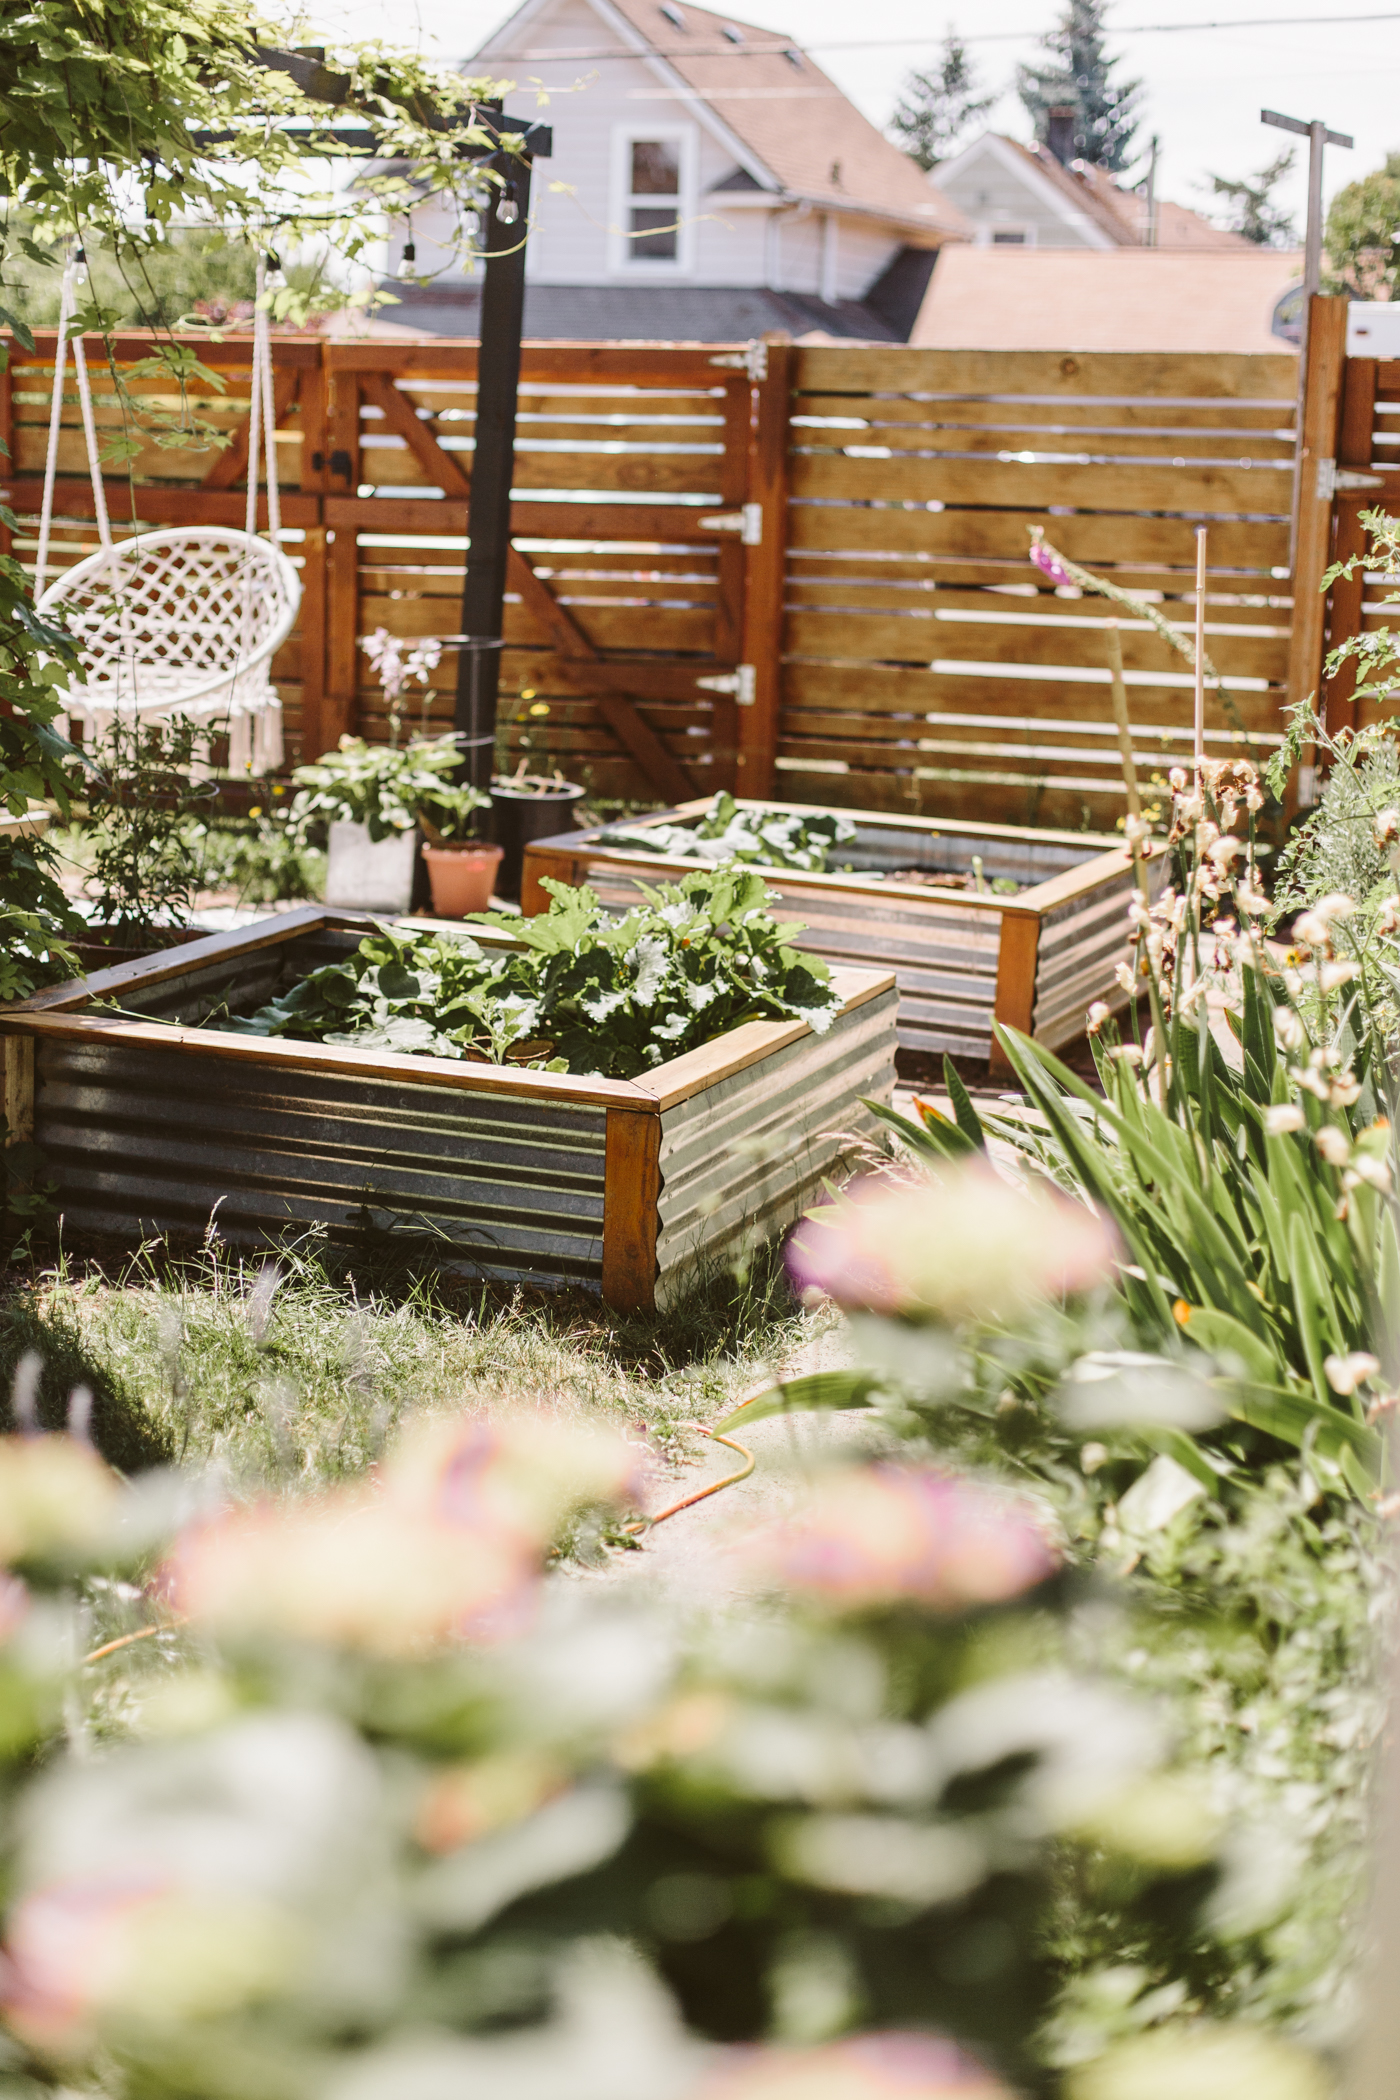 DIY corrugated metal raised beds